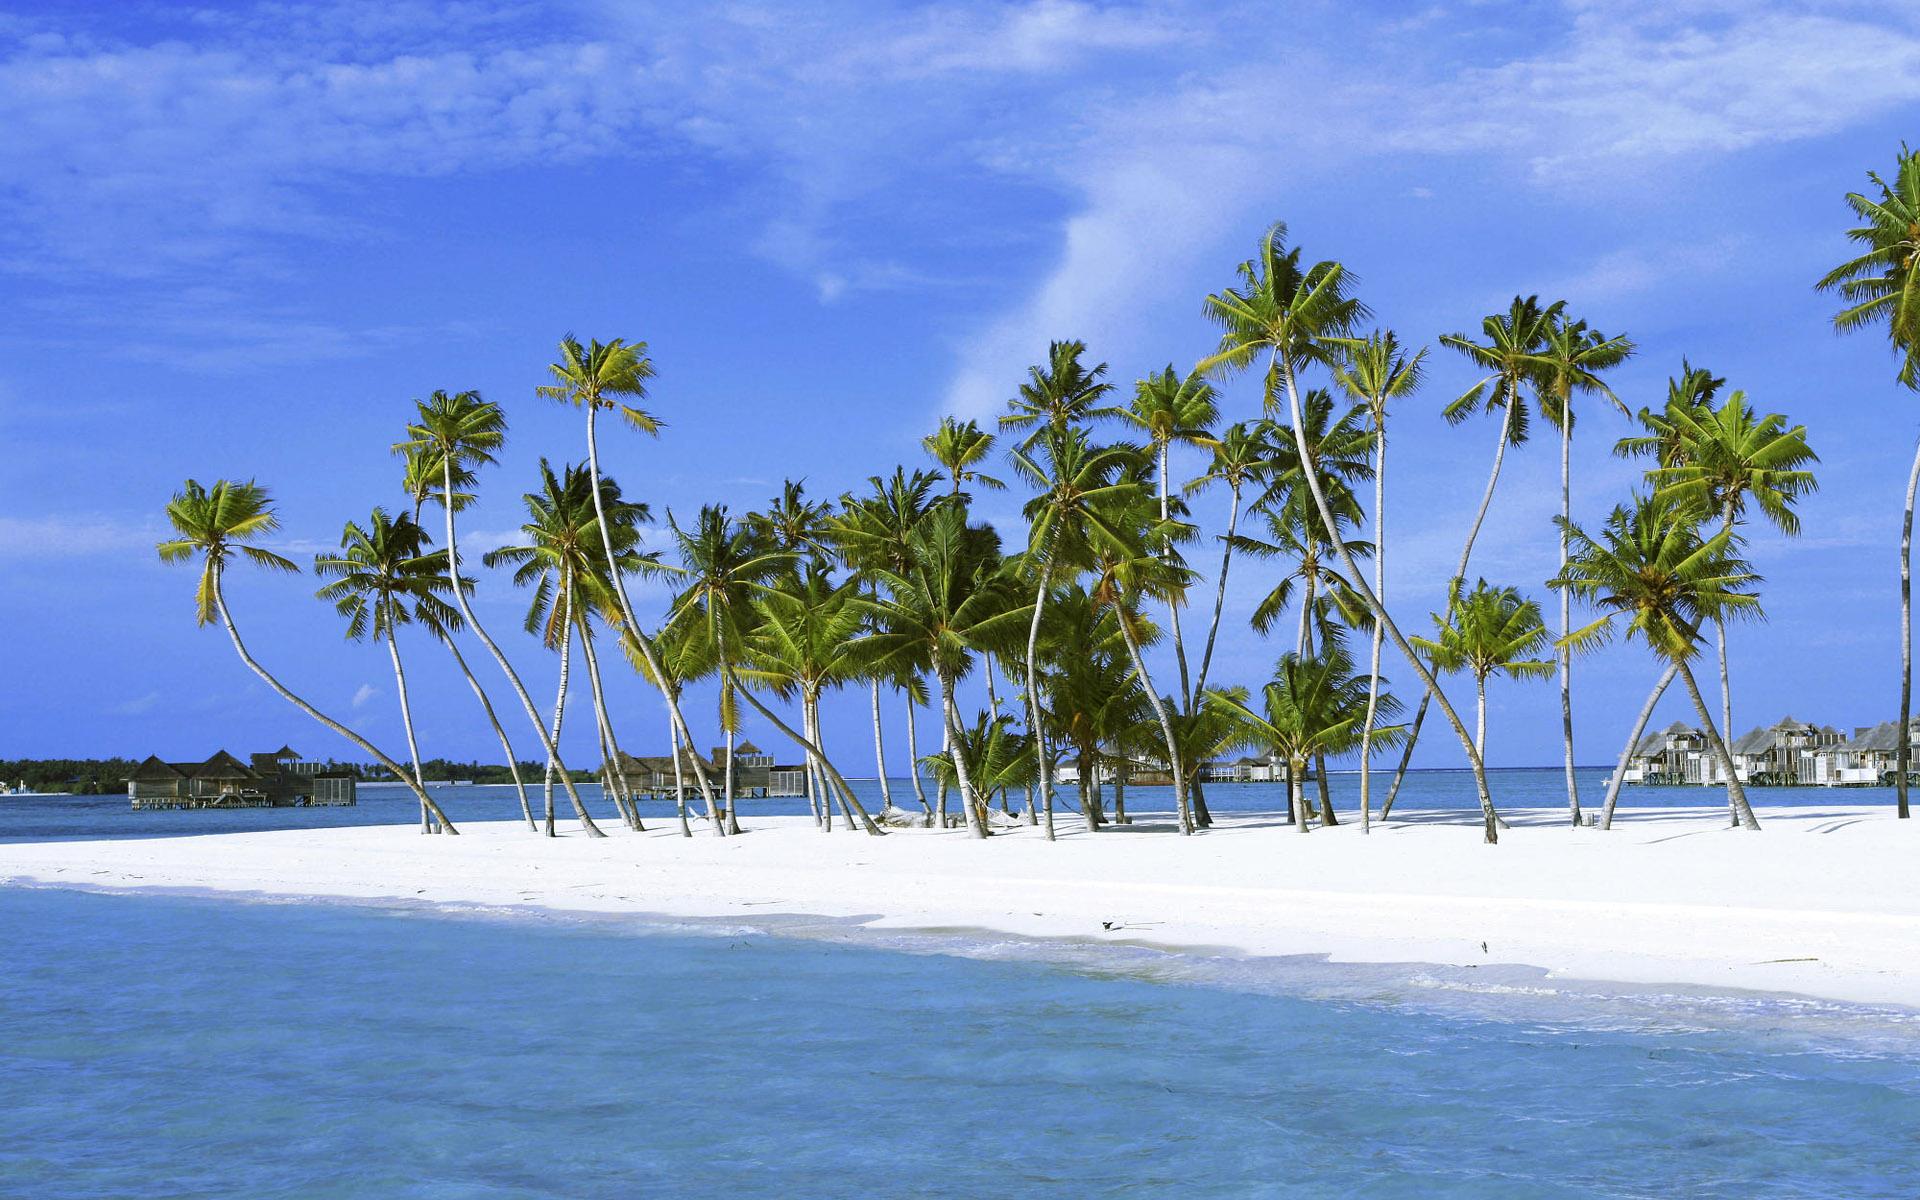 Palmtree on Island, Maldives, Indian Ocean